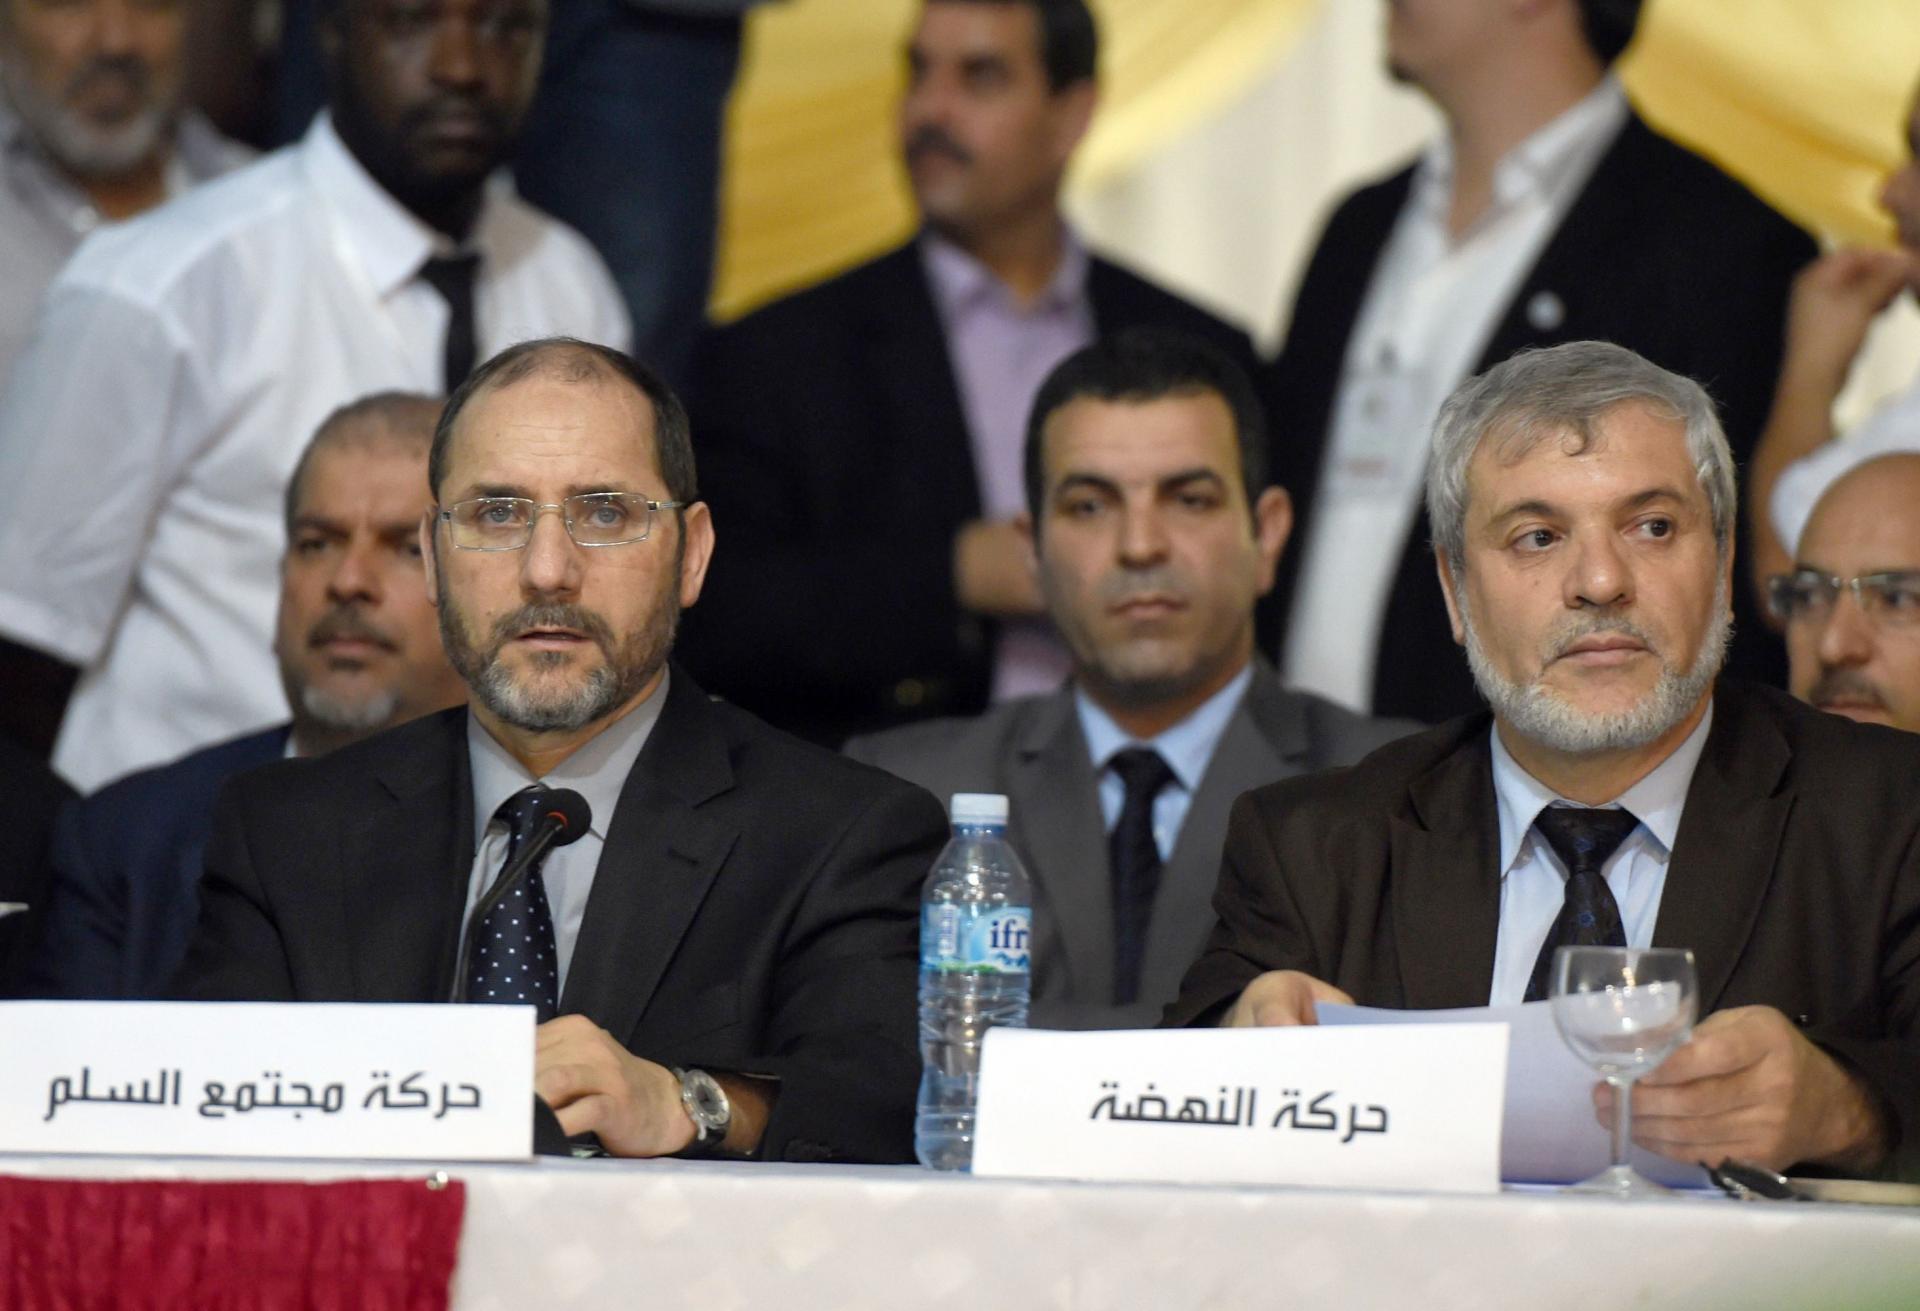 بعد اخوان مصر وسوريا وتونس.. إخوان الجزائر ينضوون تحت عباءة اردوغان